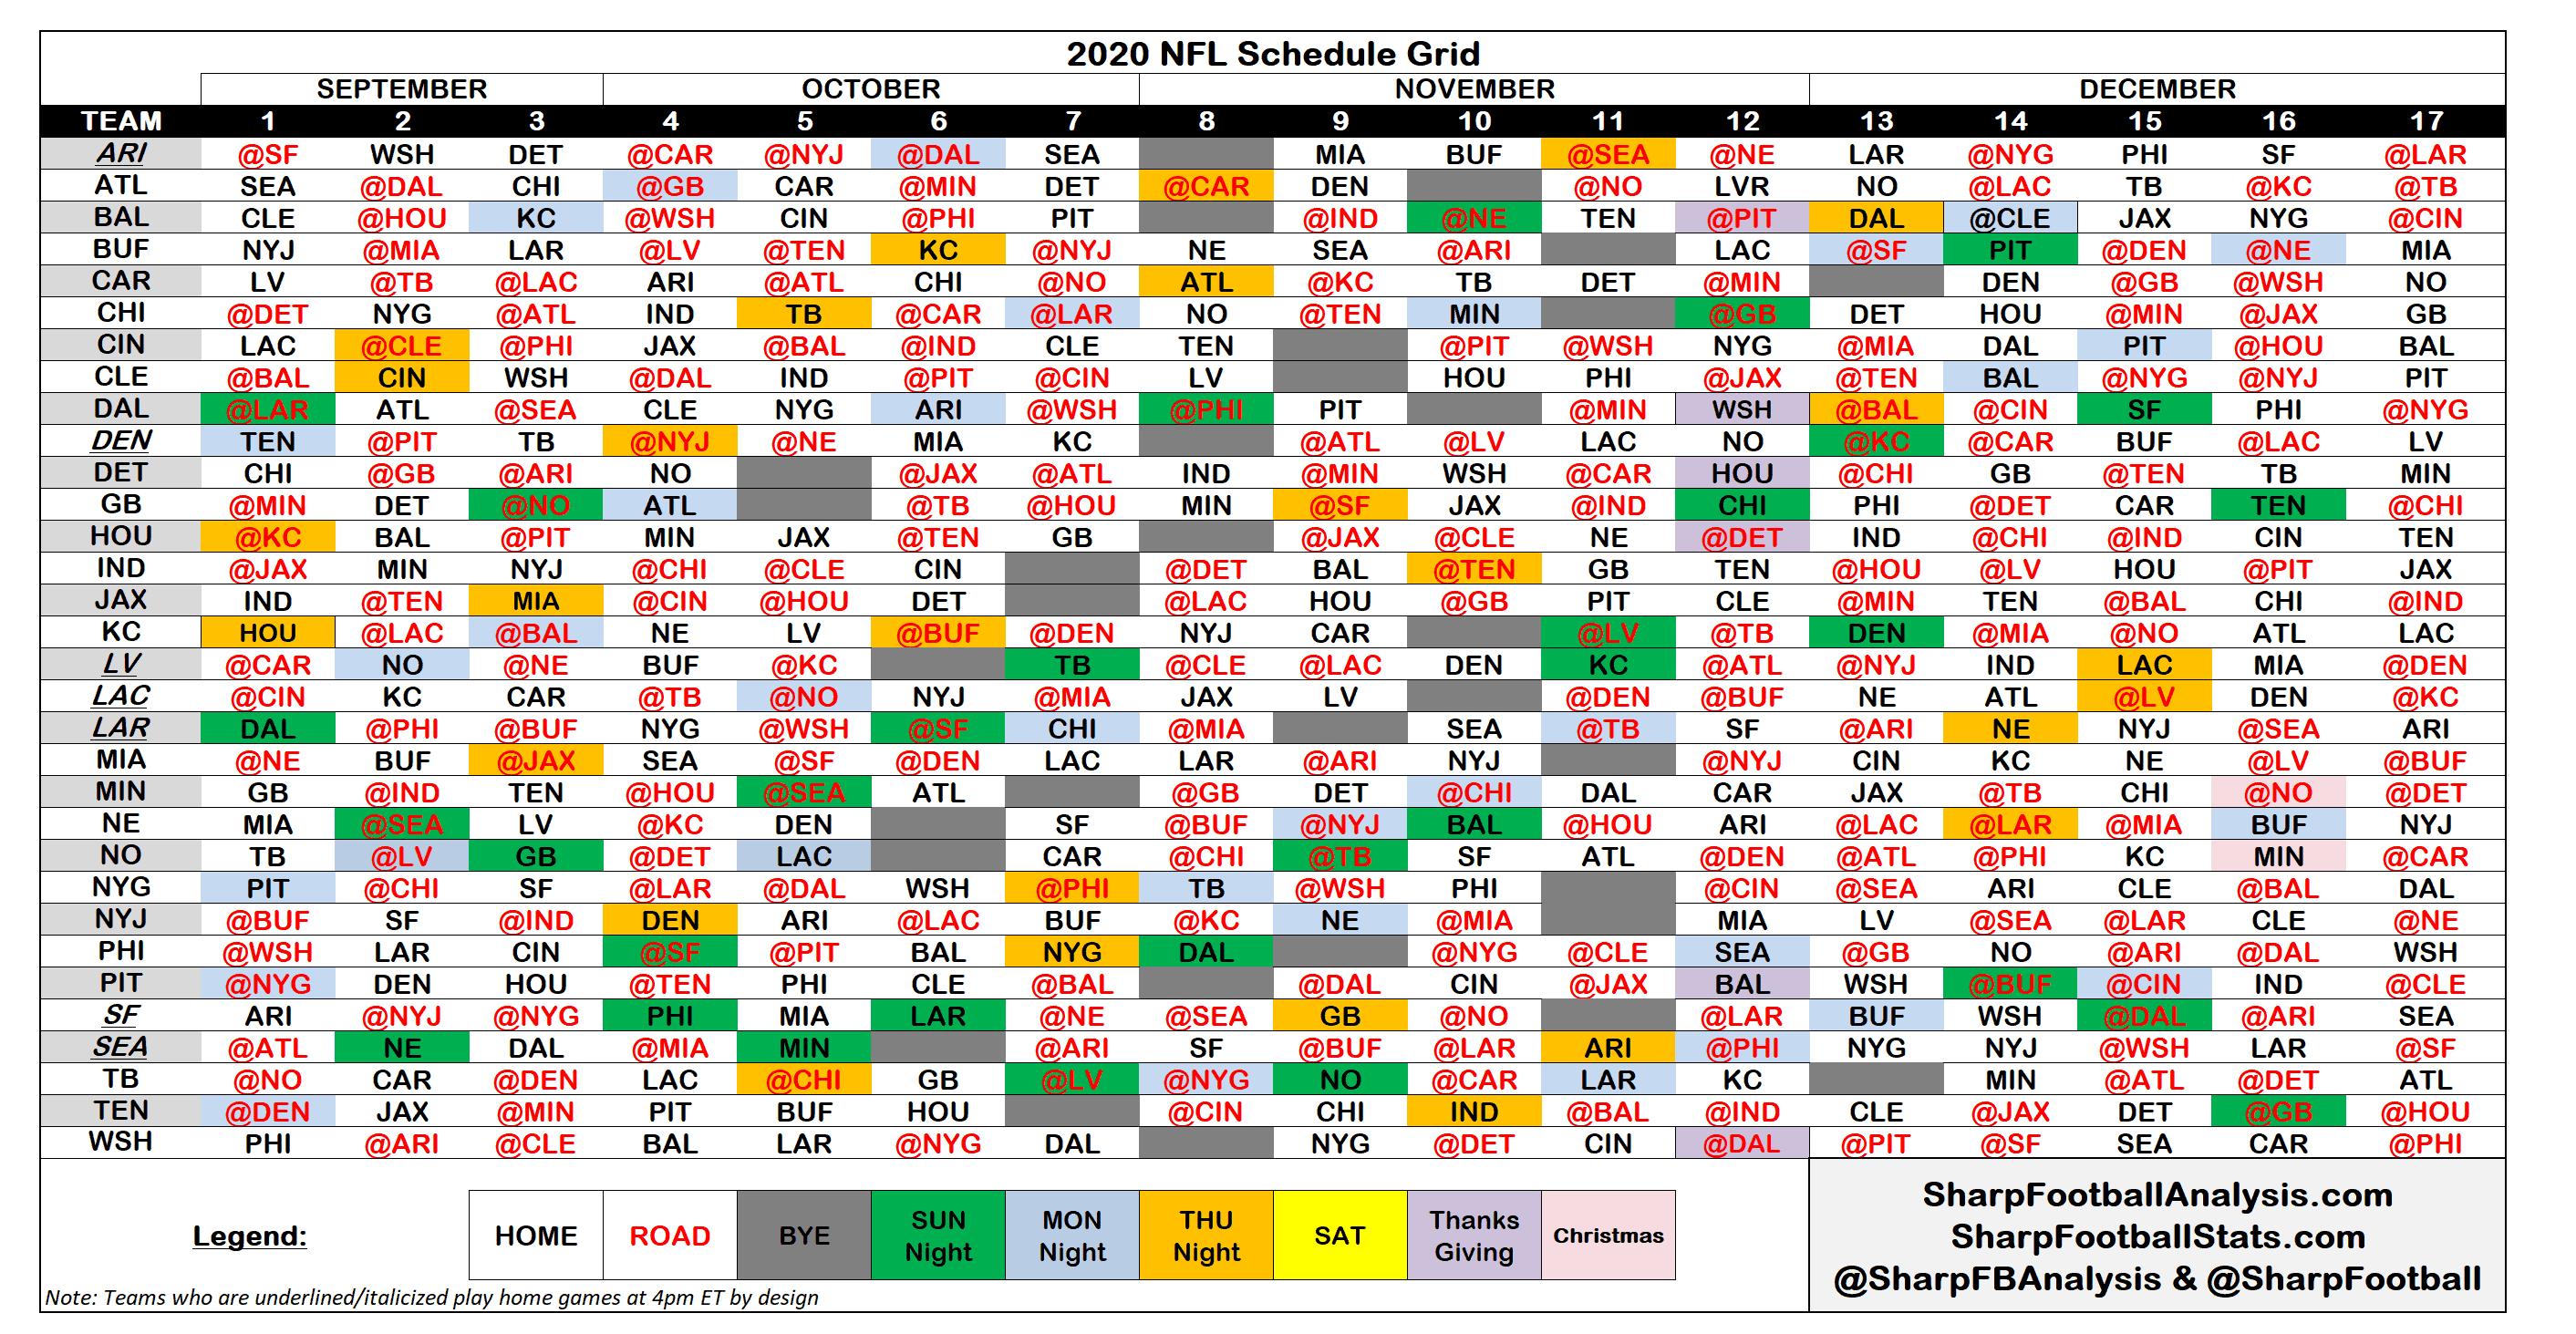 2020 Nfl Regular Season Schedule Grid & Strength Of Schedule throughout Printable Nfl Schedule 2020 Season